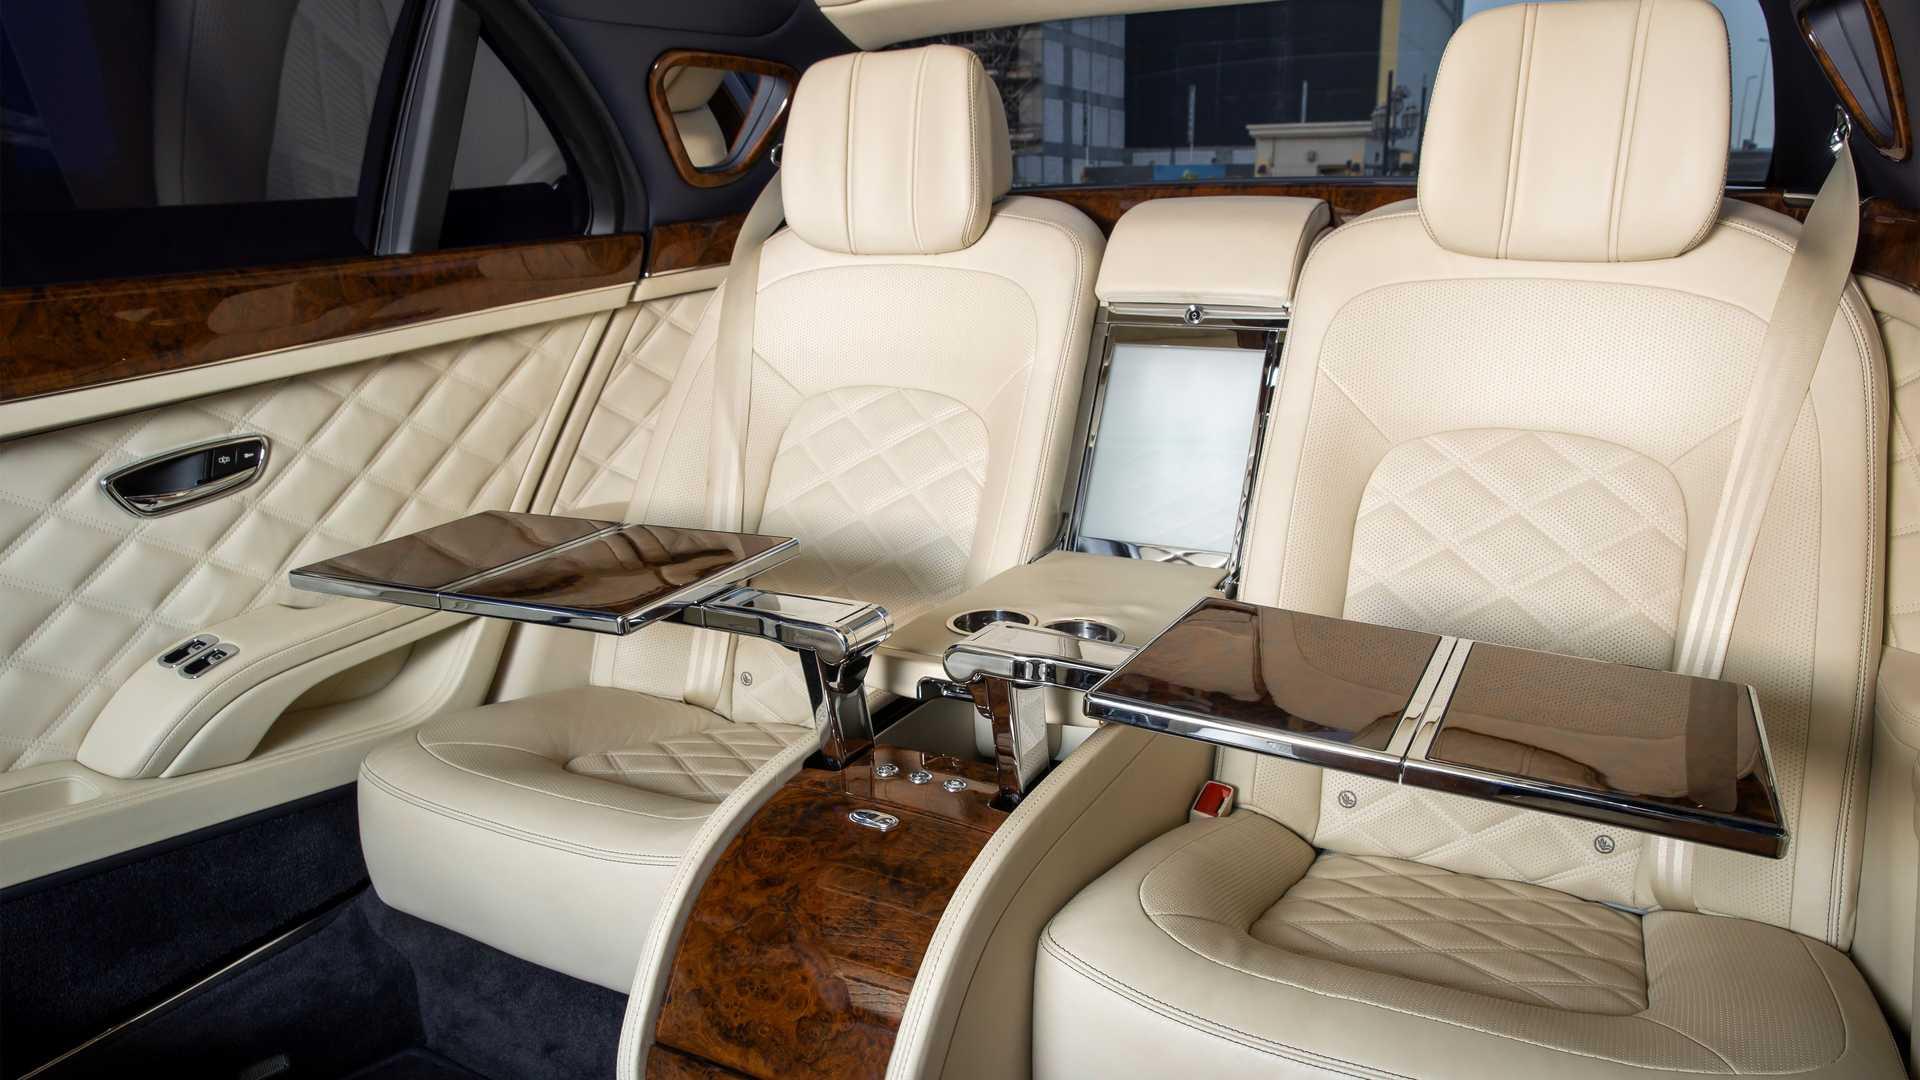 Bentley-Mulsanne-Grand-Limousine-by-Mulliner-8